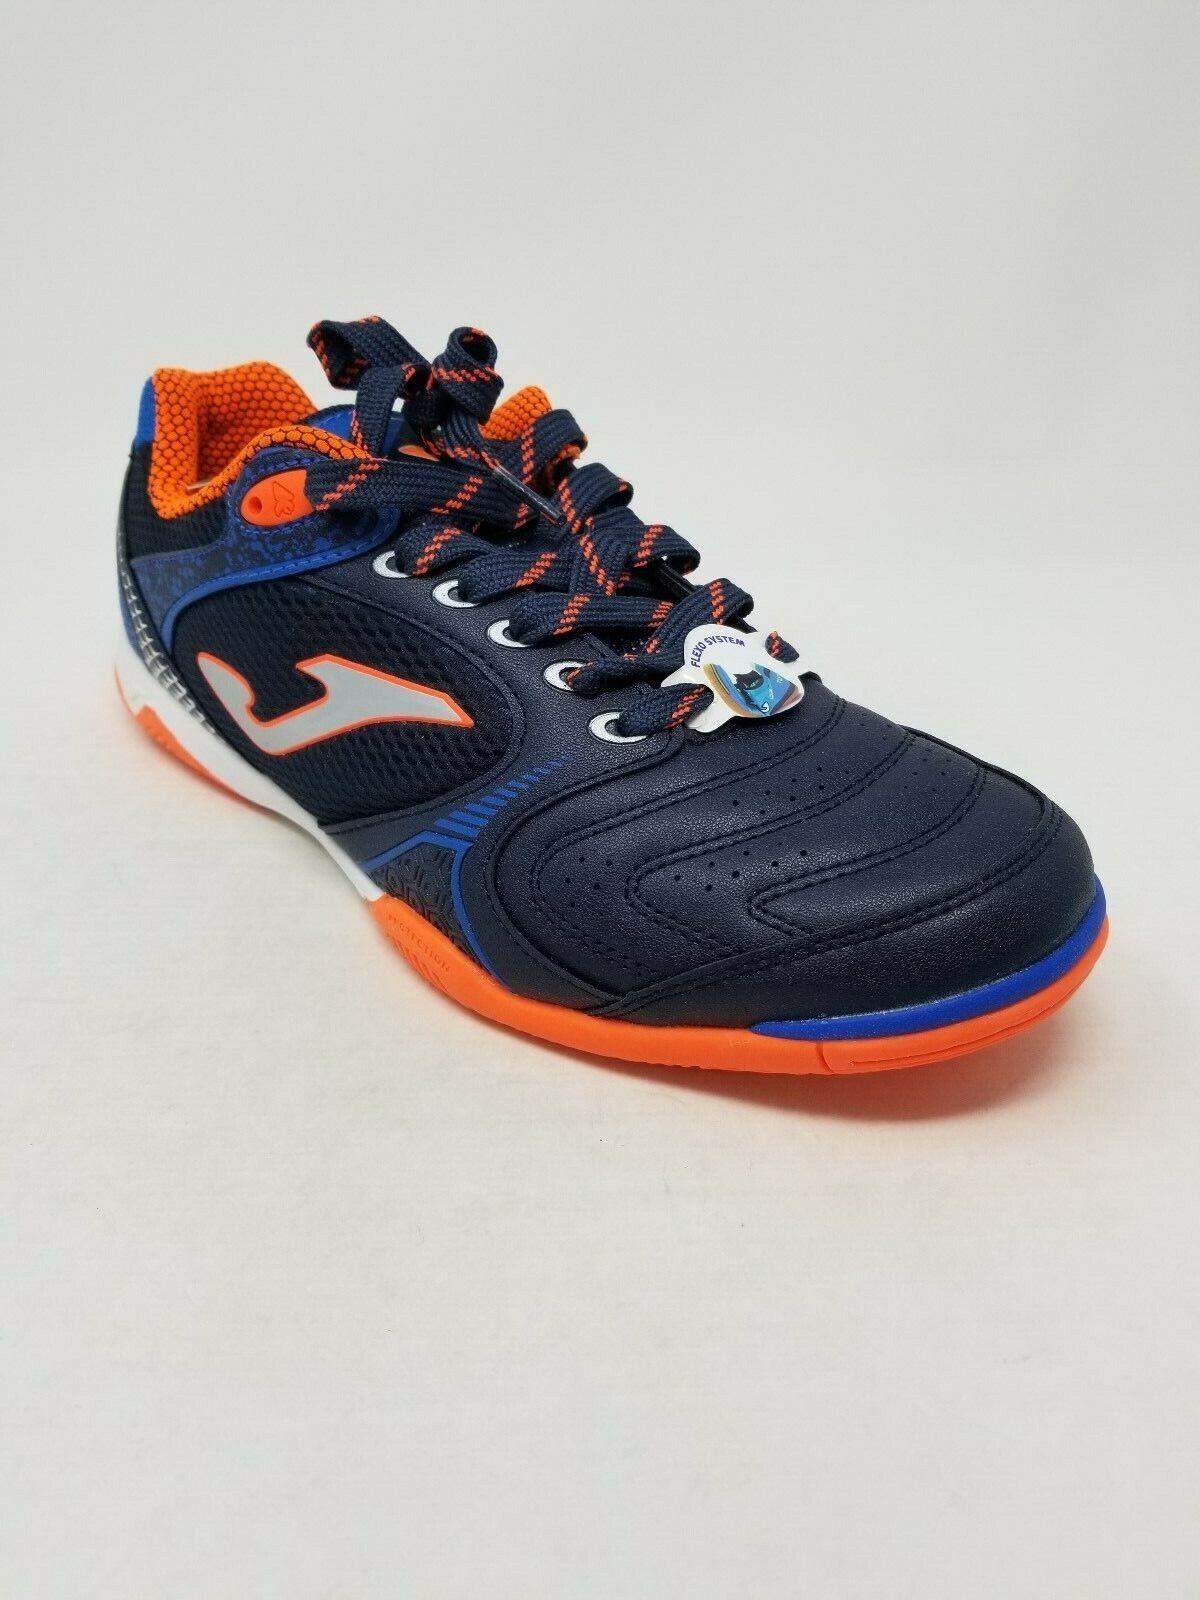 A114 Joma Men's Dribling Indoor Soccer Shoe, Blue/Orange, Si